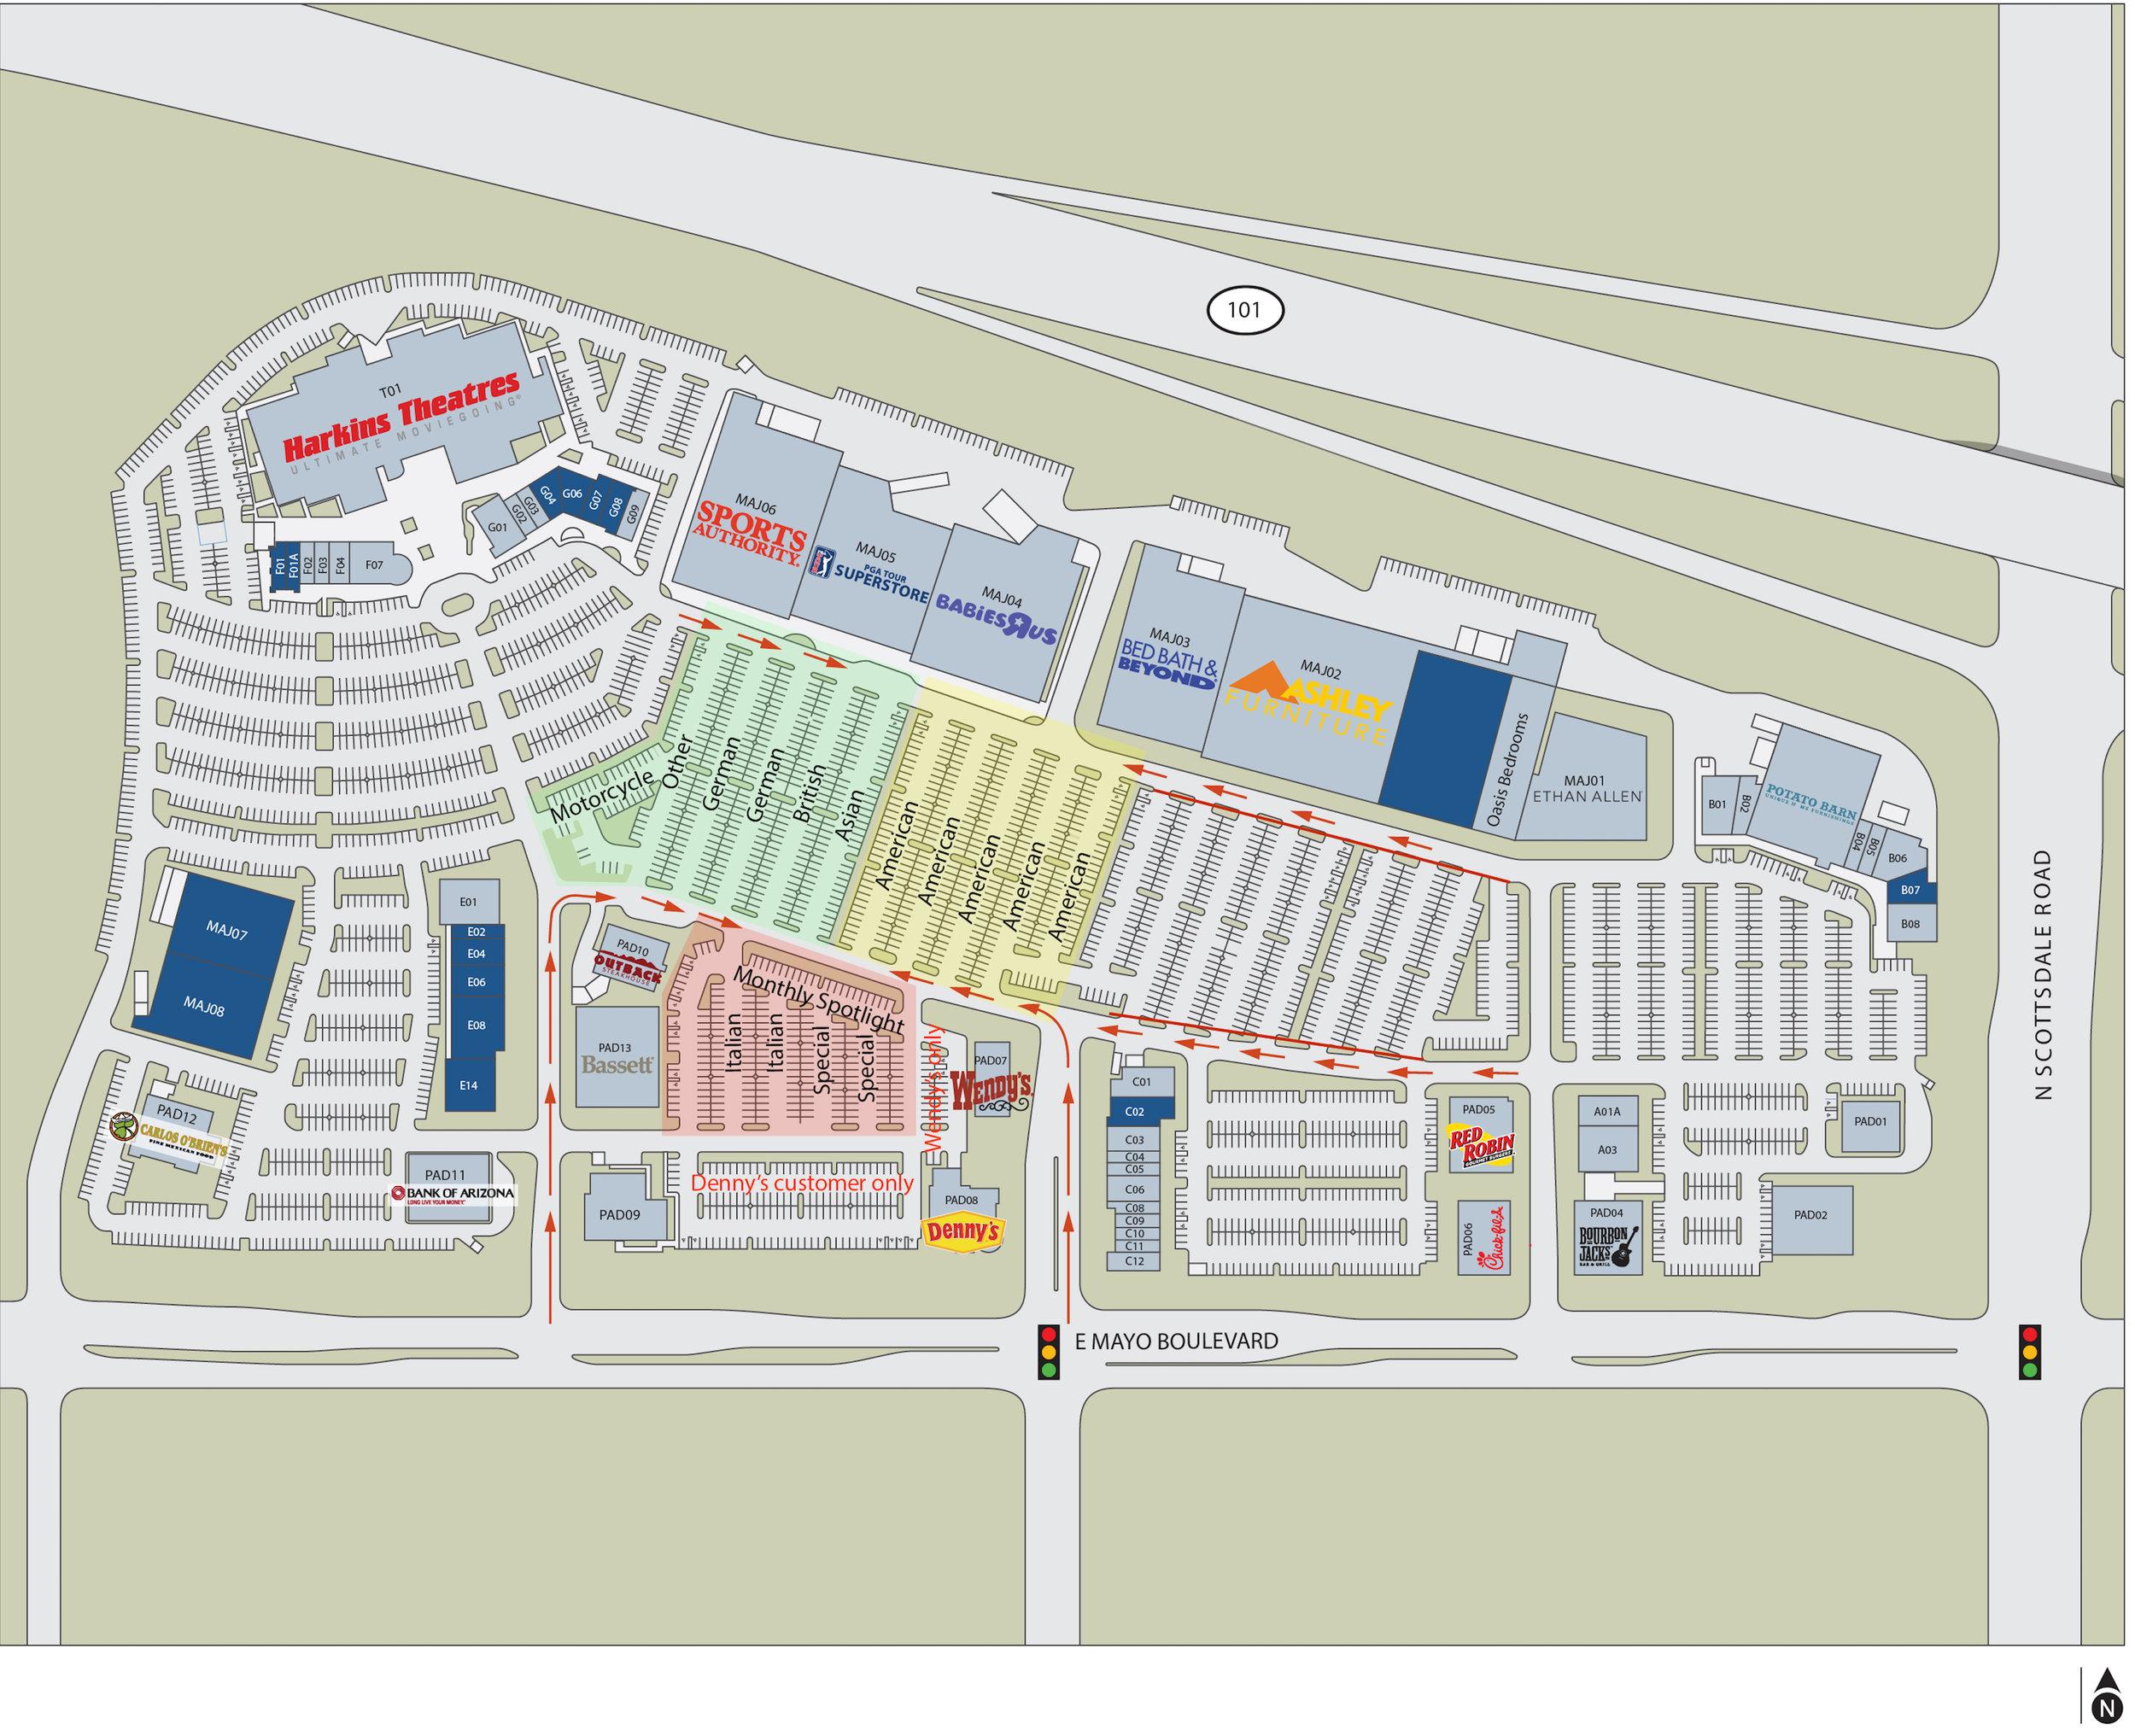 Scottsdale 101 new parking for April 2018 Plan.jpg